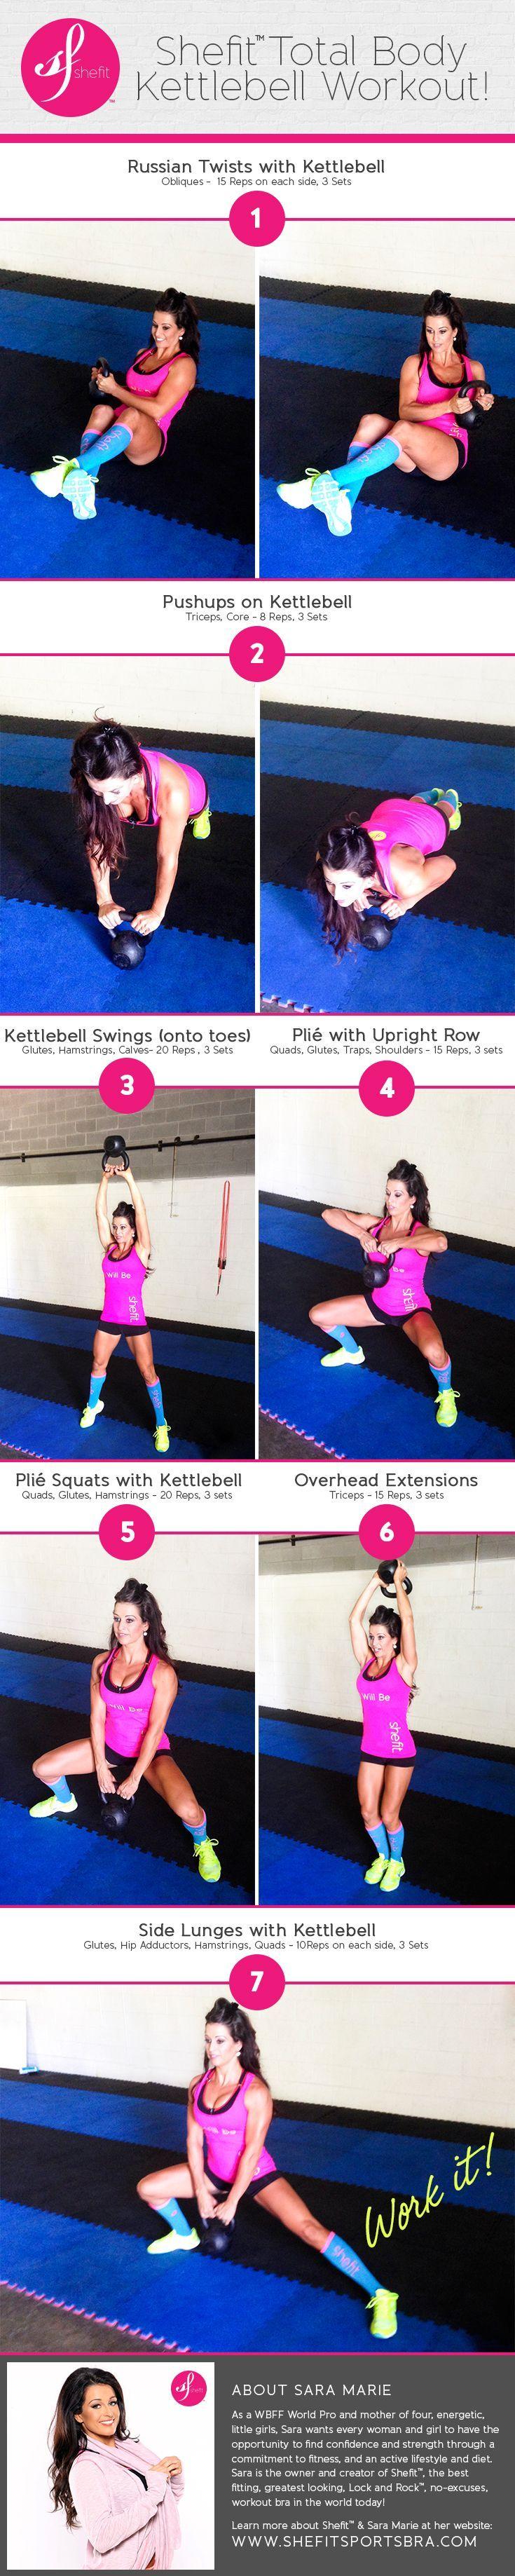 Shefit Total Body Kettlebell Workout